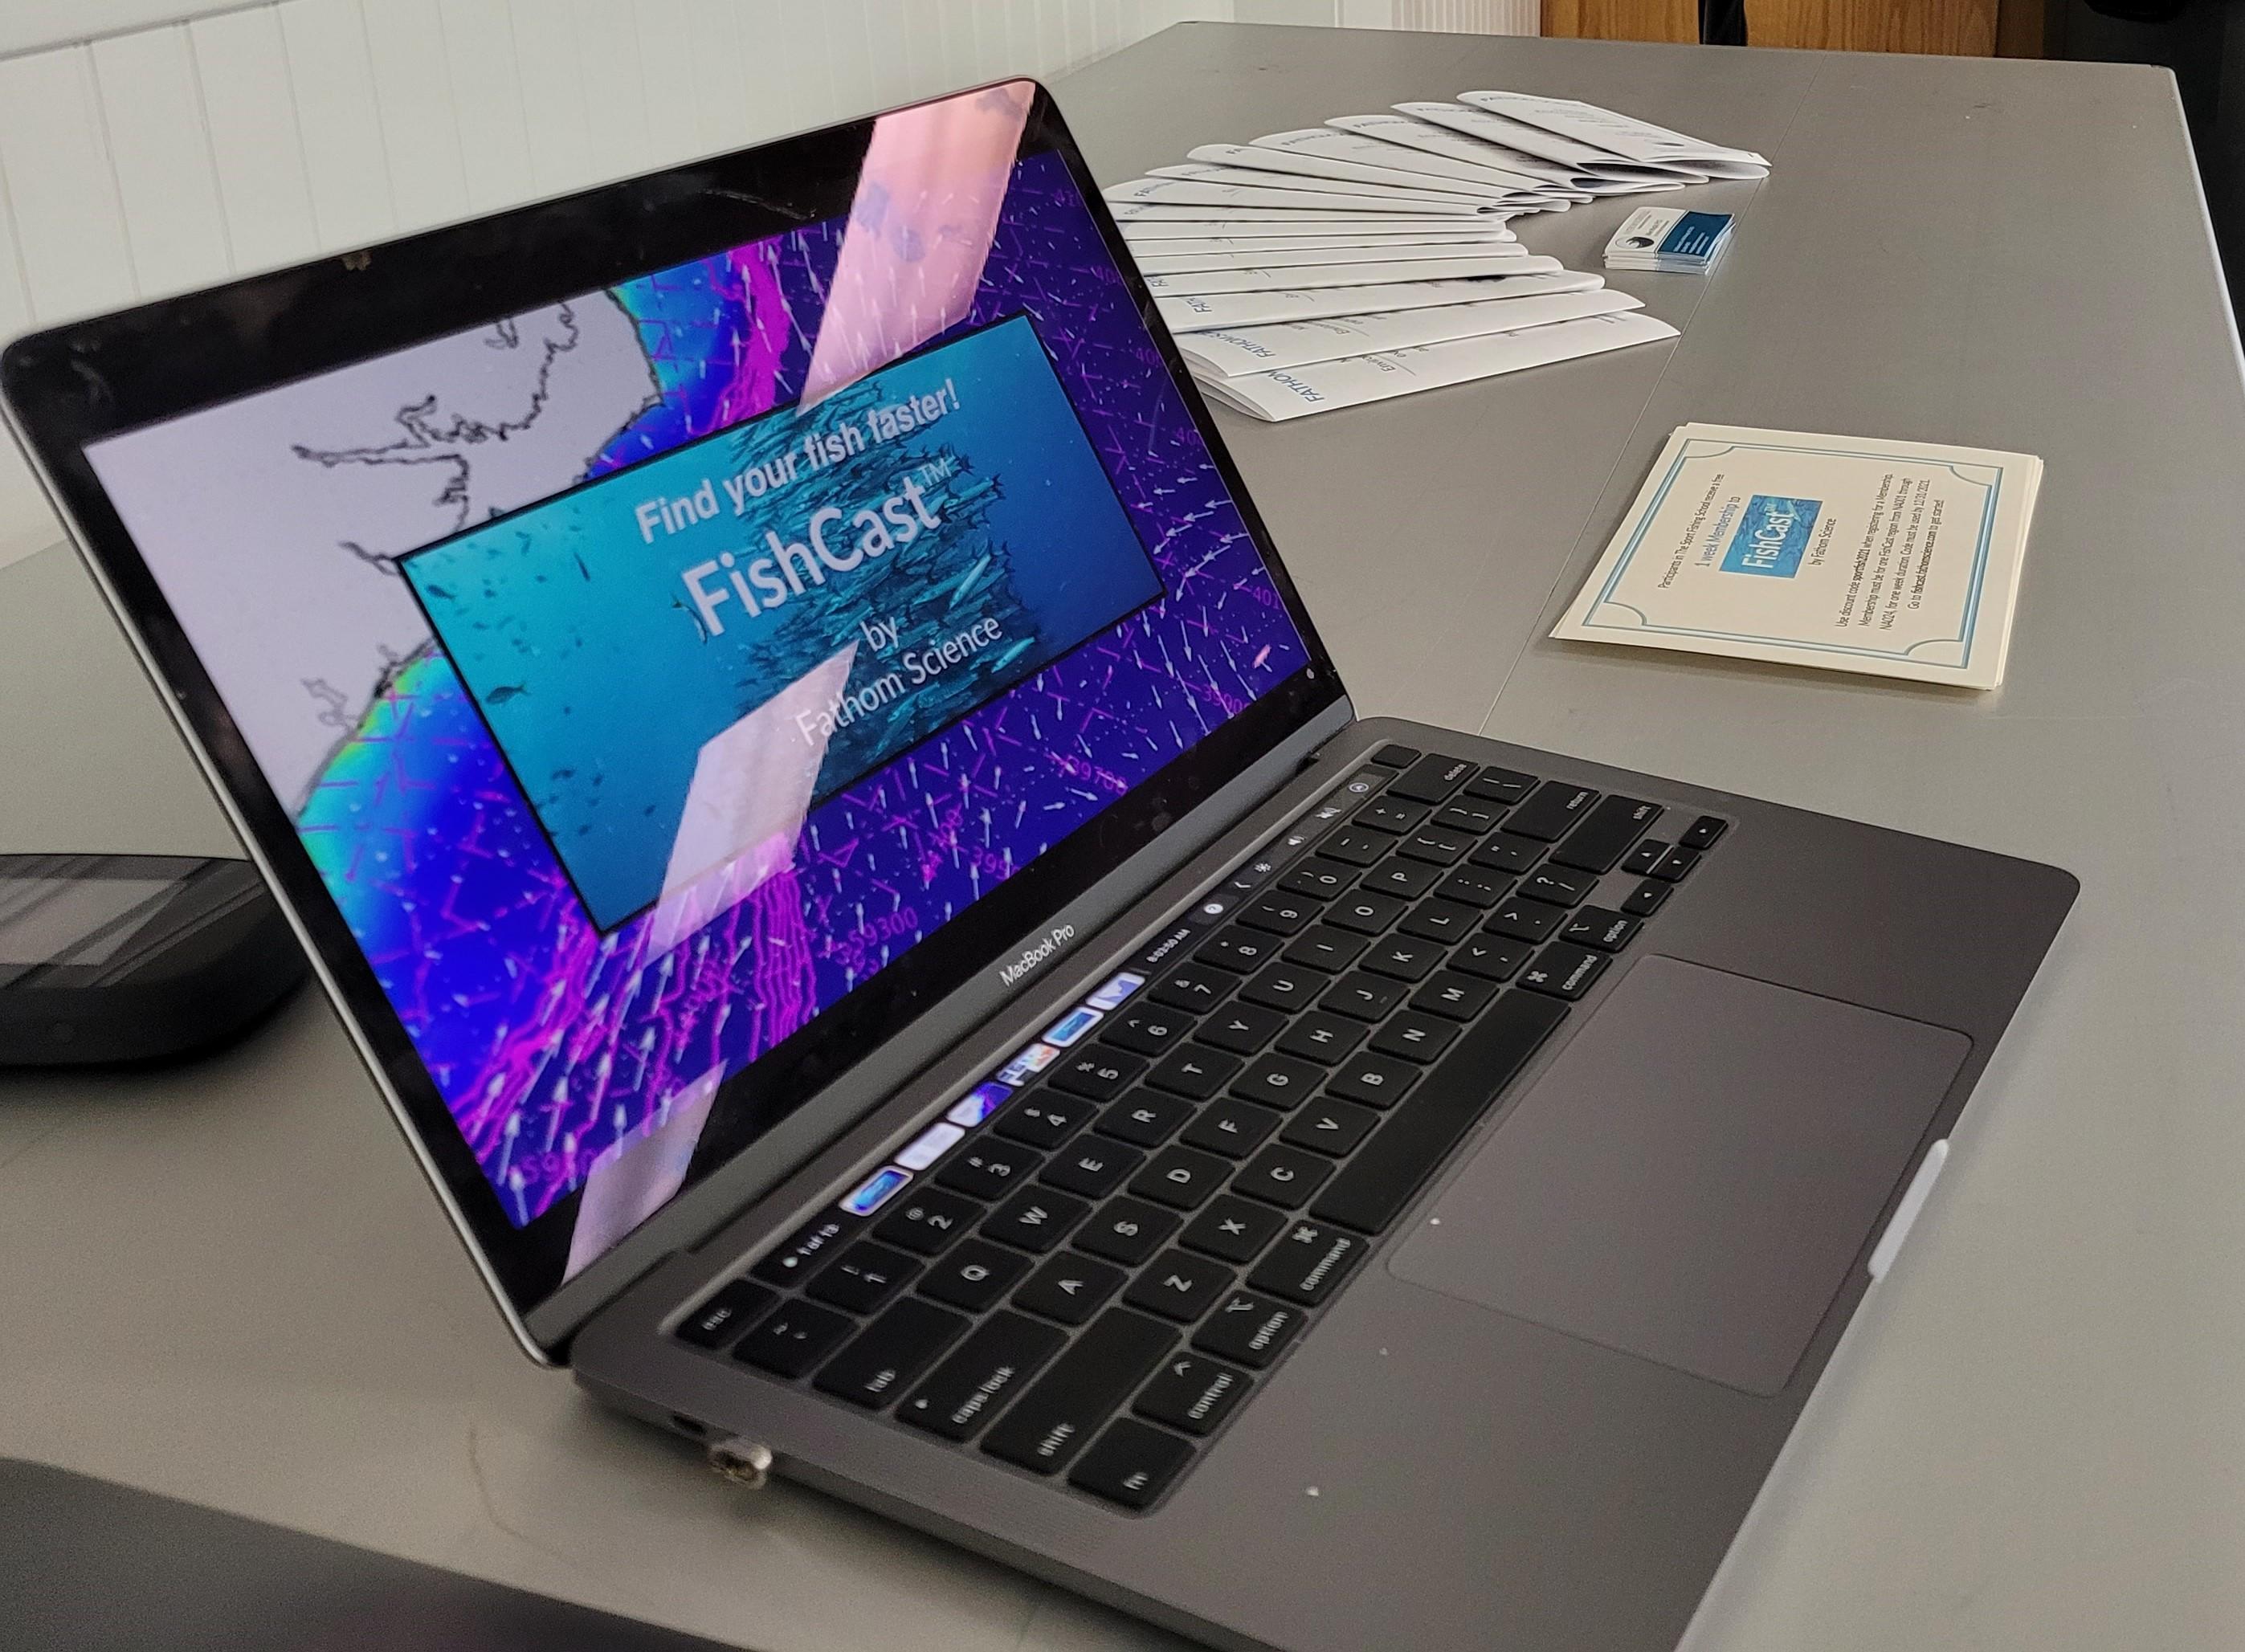 FishCast shown on laptop